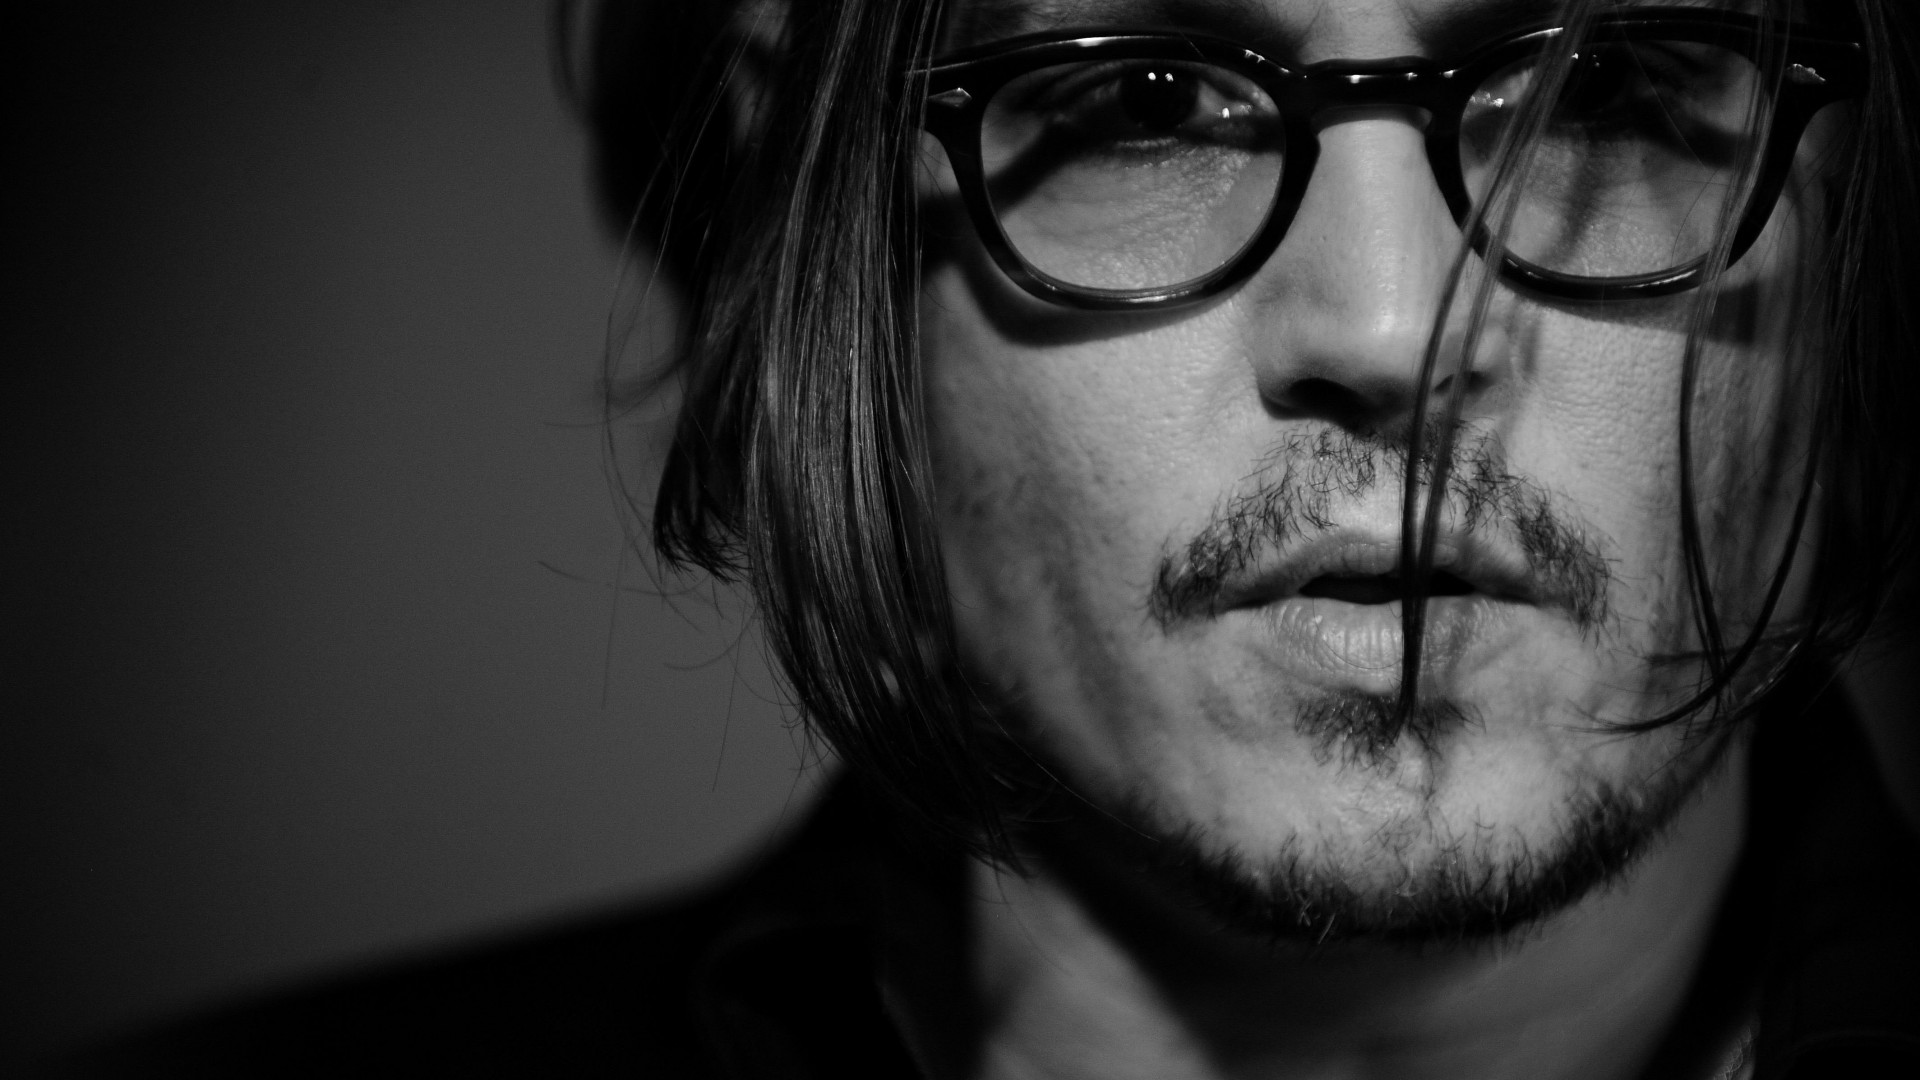 Wallpaper Johnny Depp director musician screenwriter producer 1920x1080